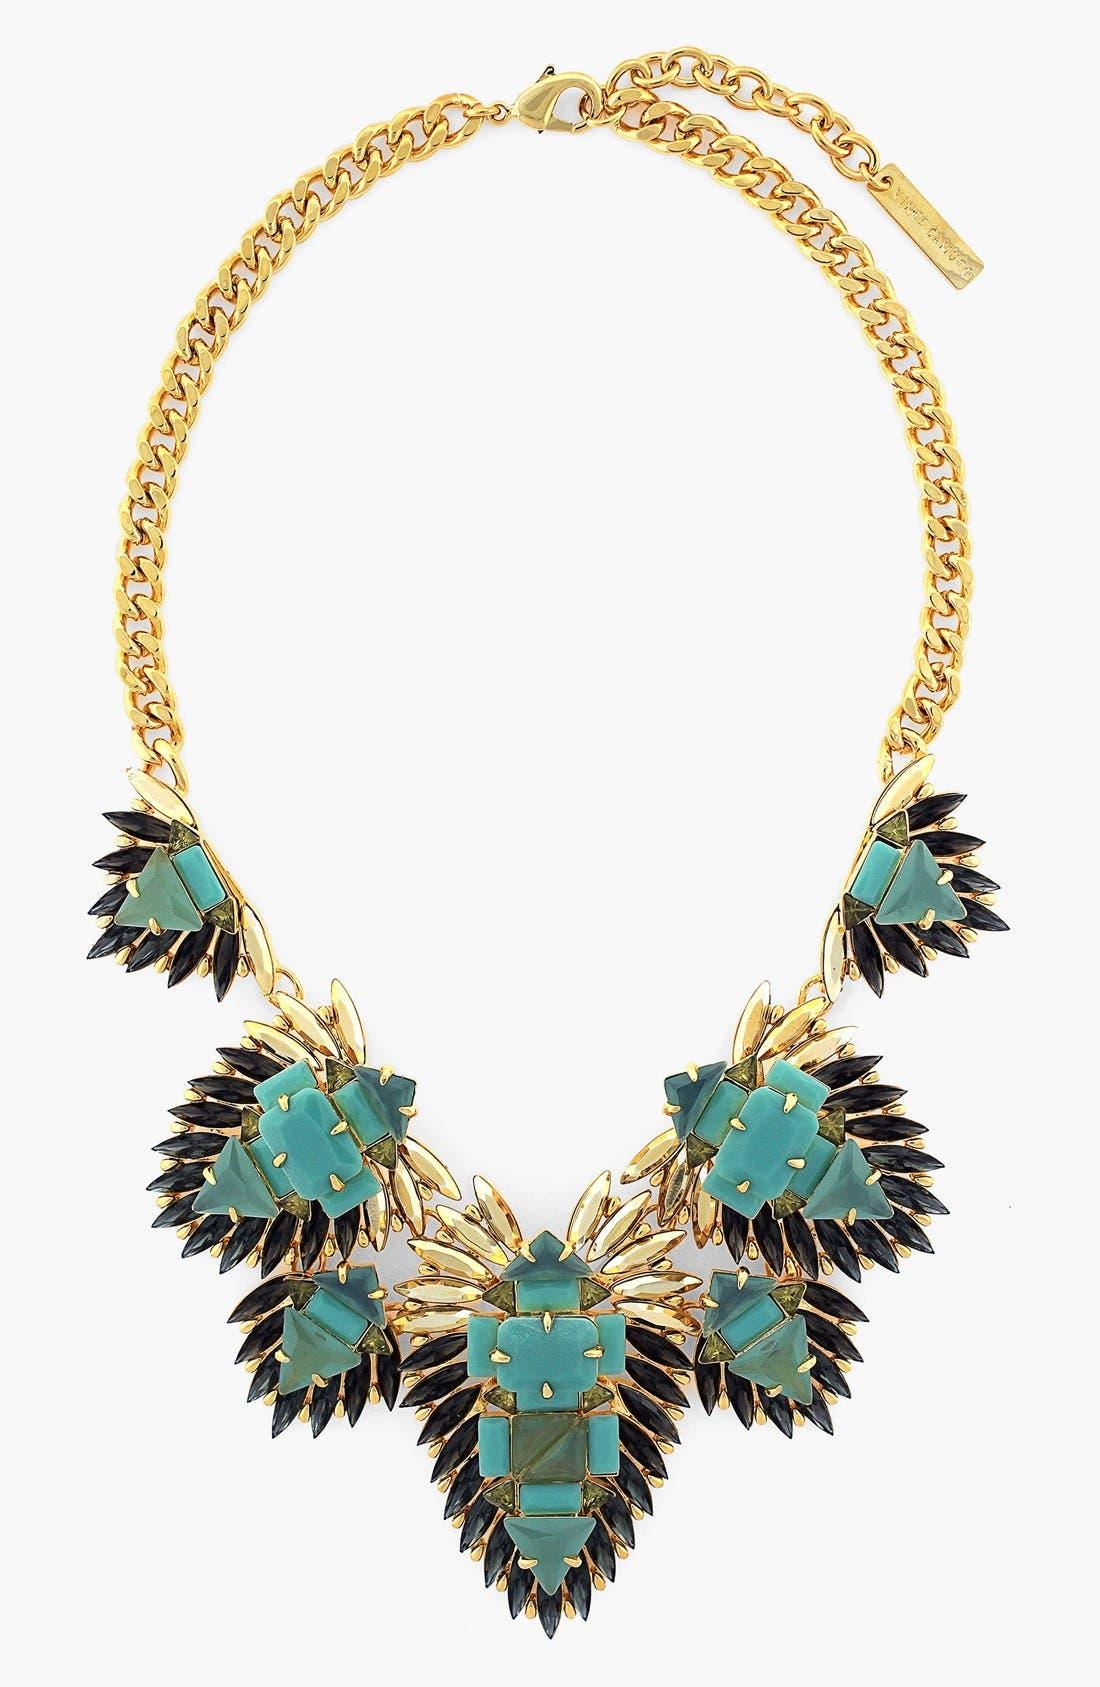 Main Image - Vince Camuto 'Aqua Glam' Statement Necklace